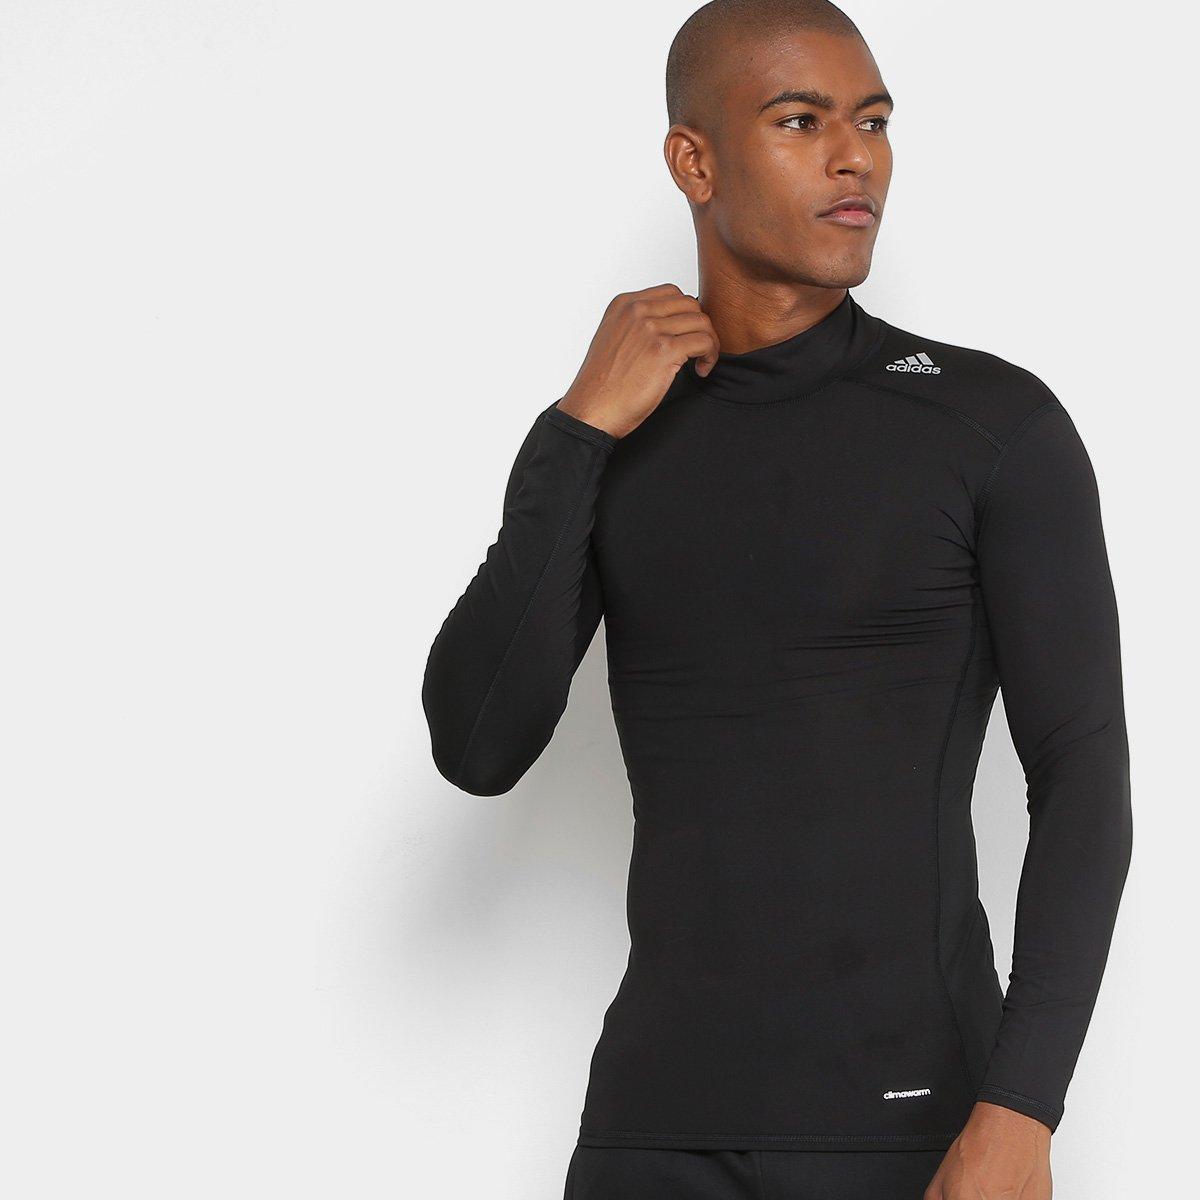 ba6a559a95 Camiseta Adidas Techfit Base Warm Mock Manga Longa - Compre Agora ...